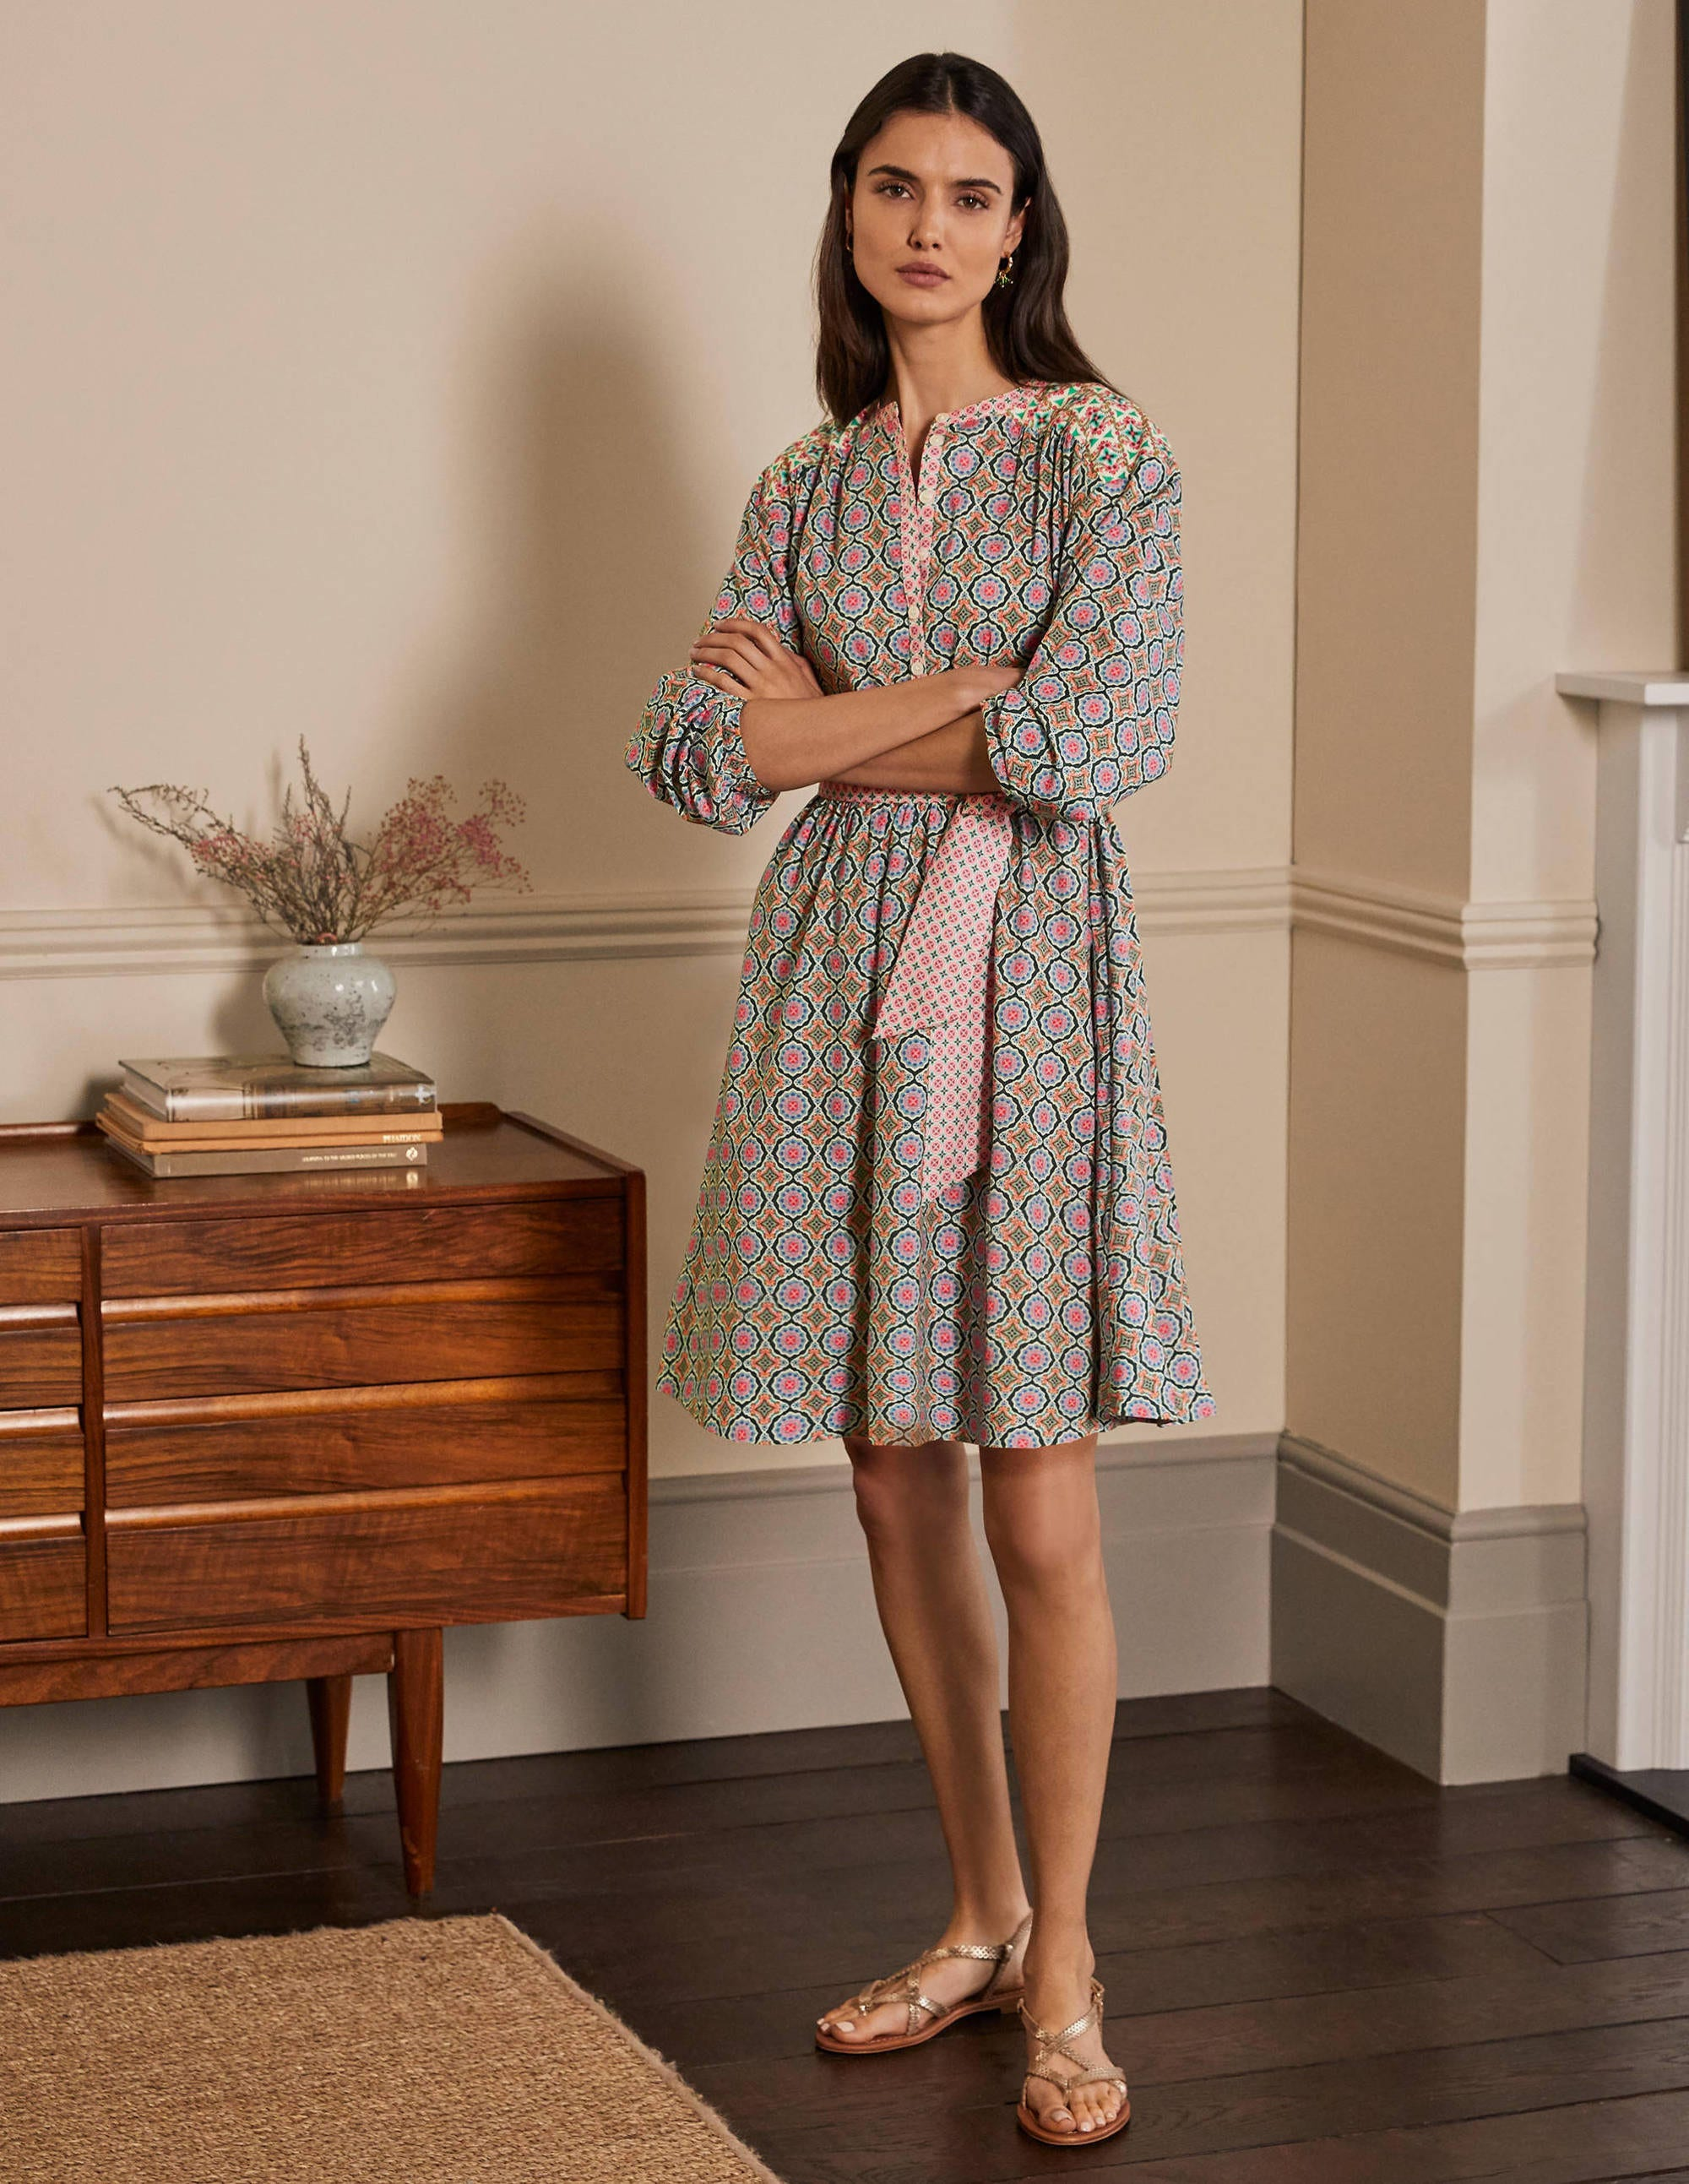 Boden Belted Cotton Dress - Ivory, Mosaic Tile